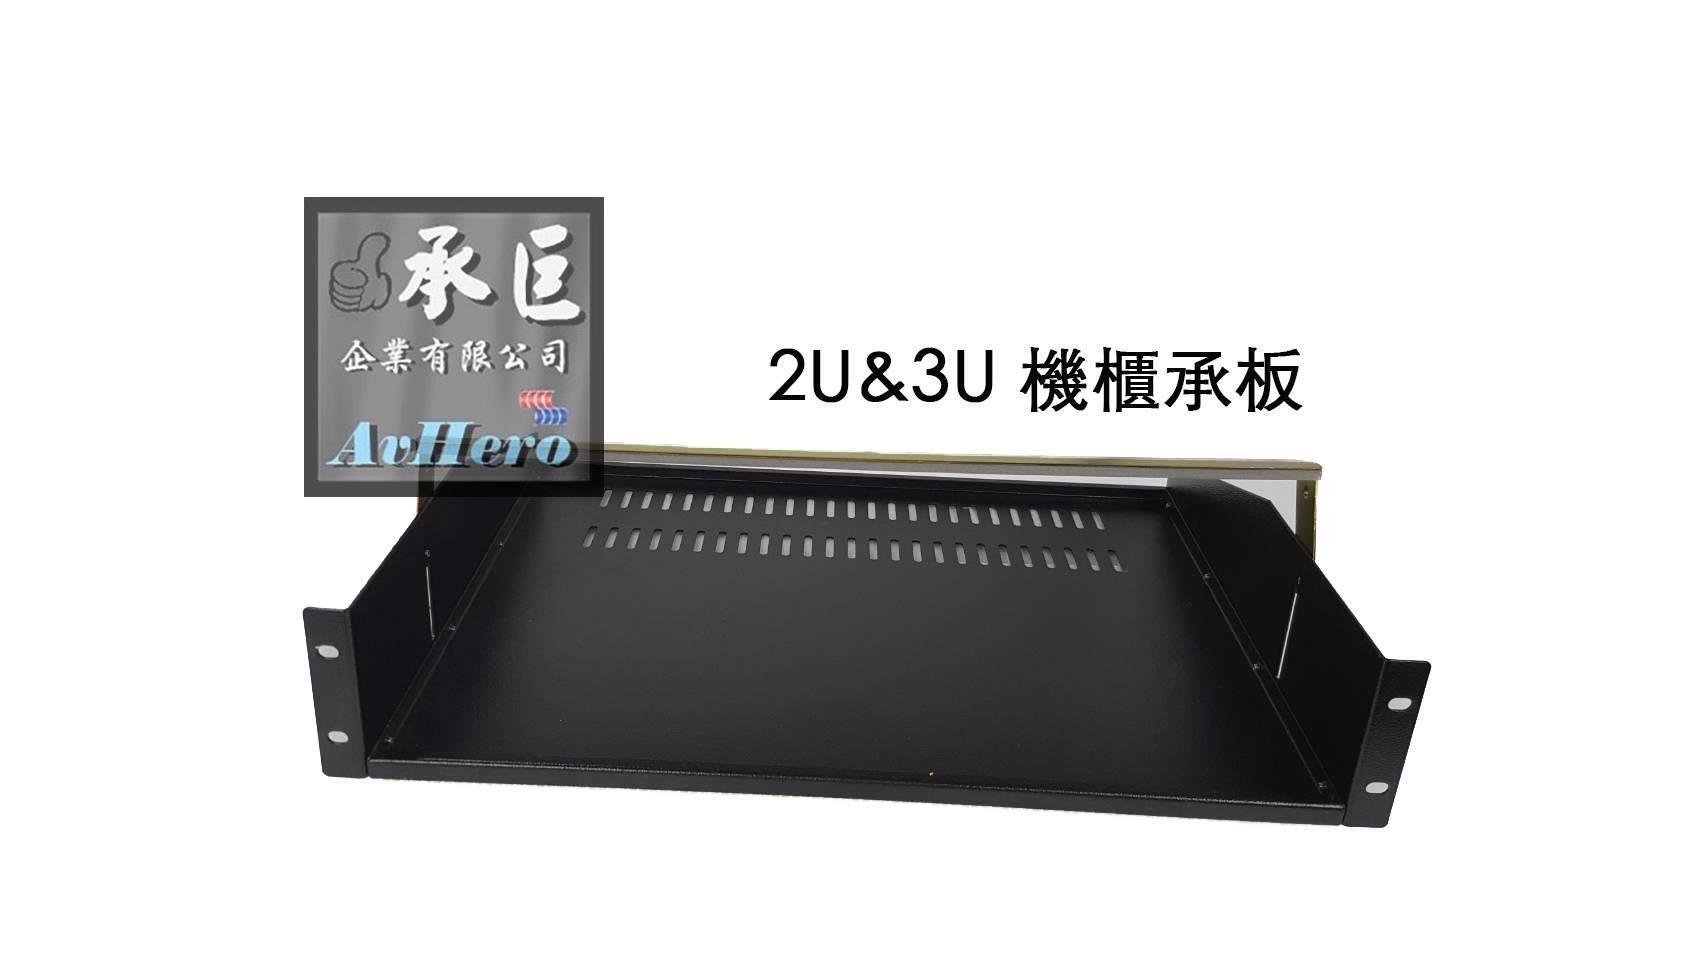 2U&3U機櫃承板